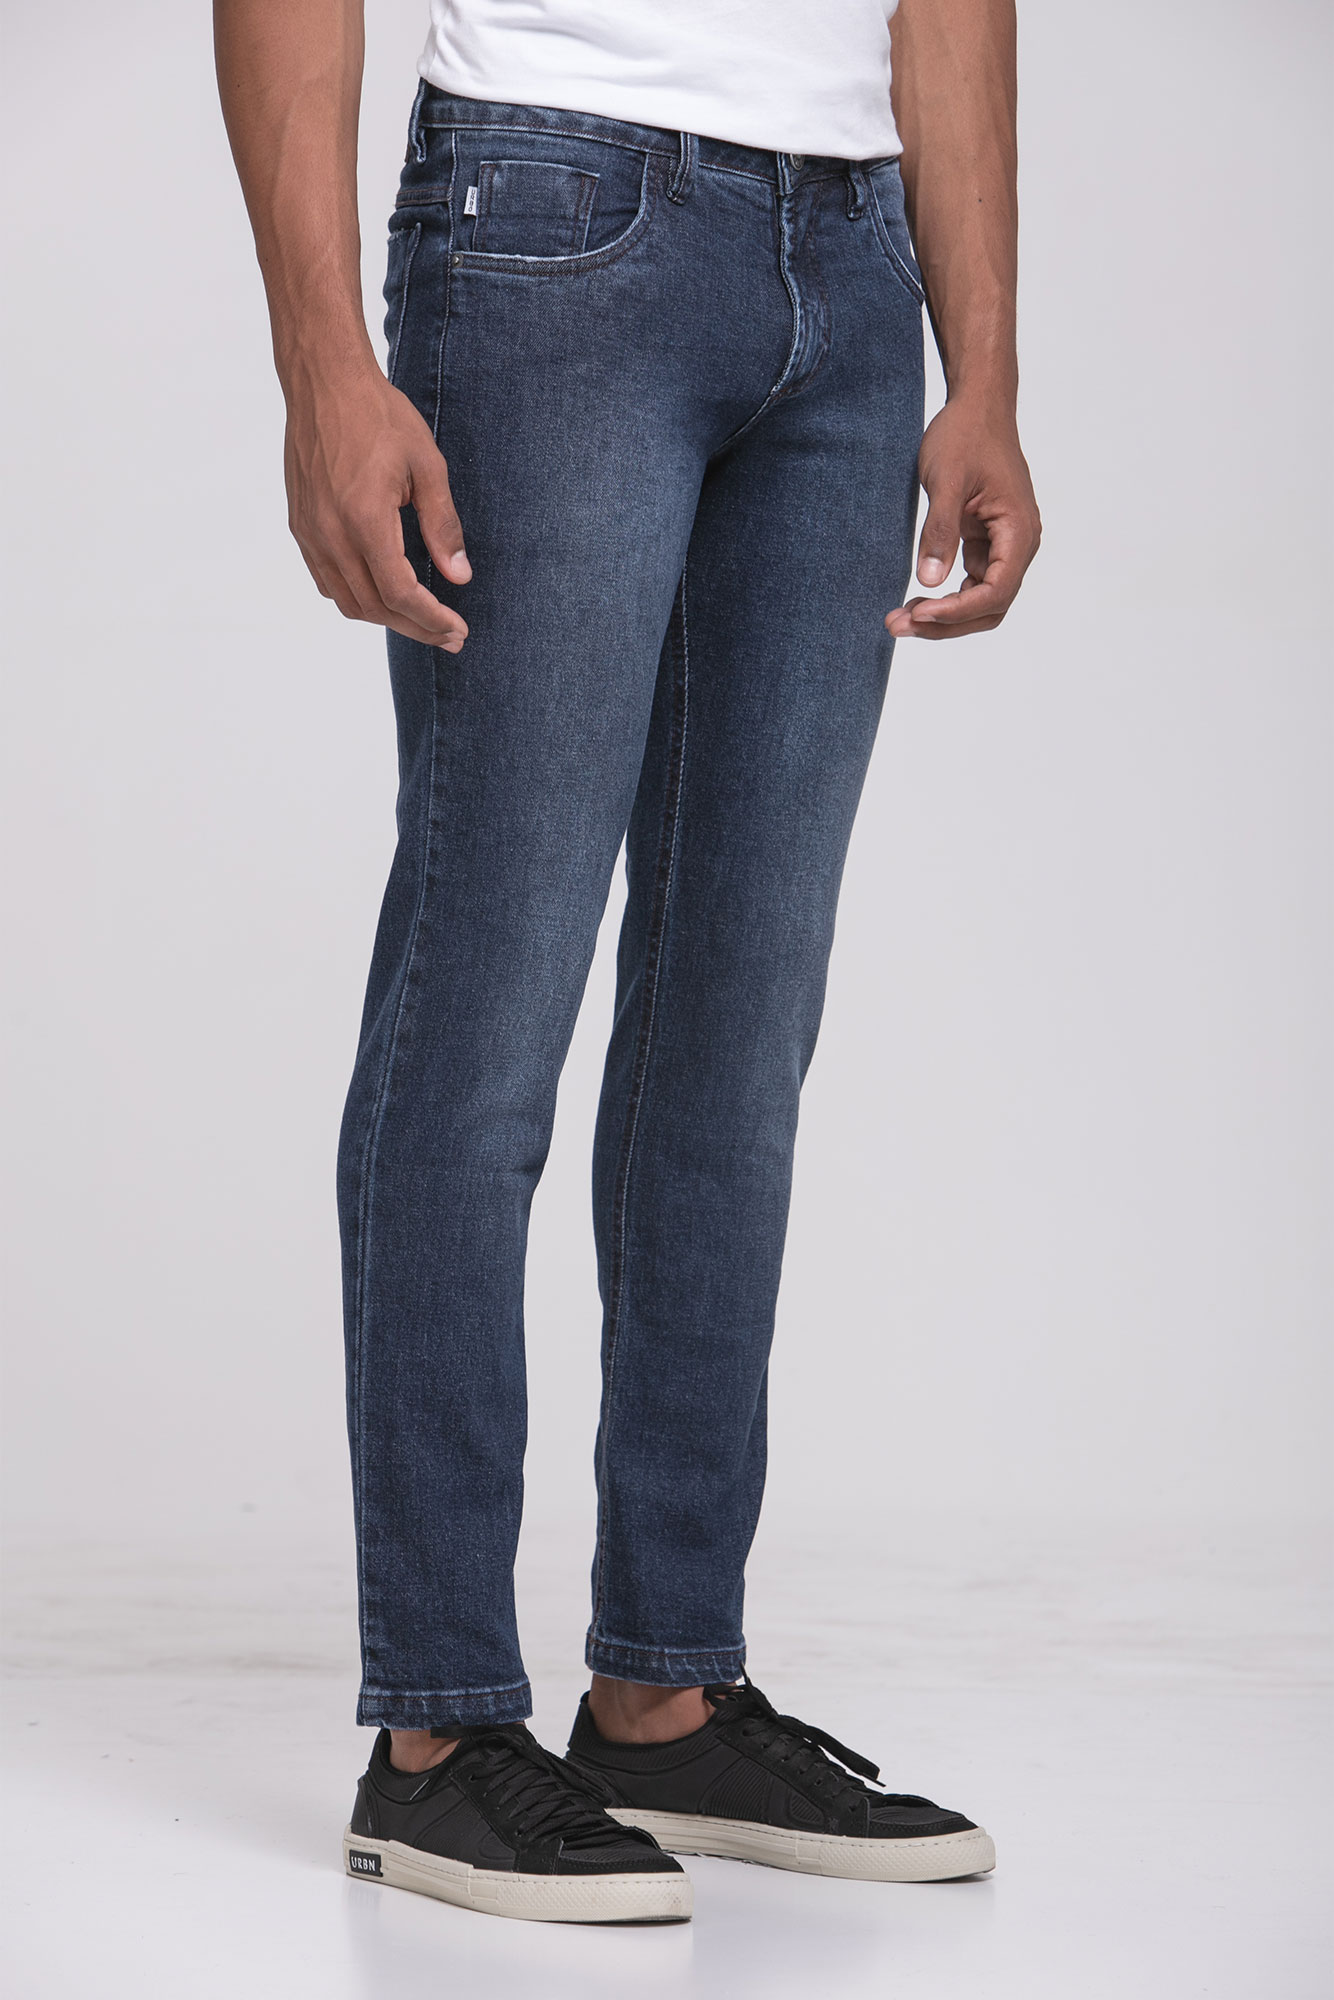 Calça Jeans Galaxy Blue